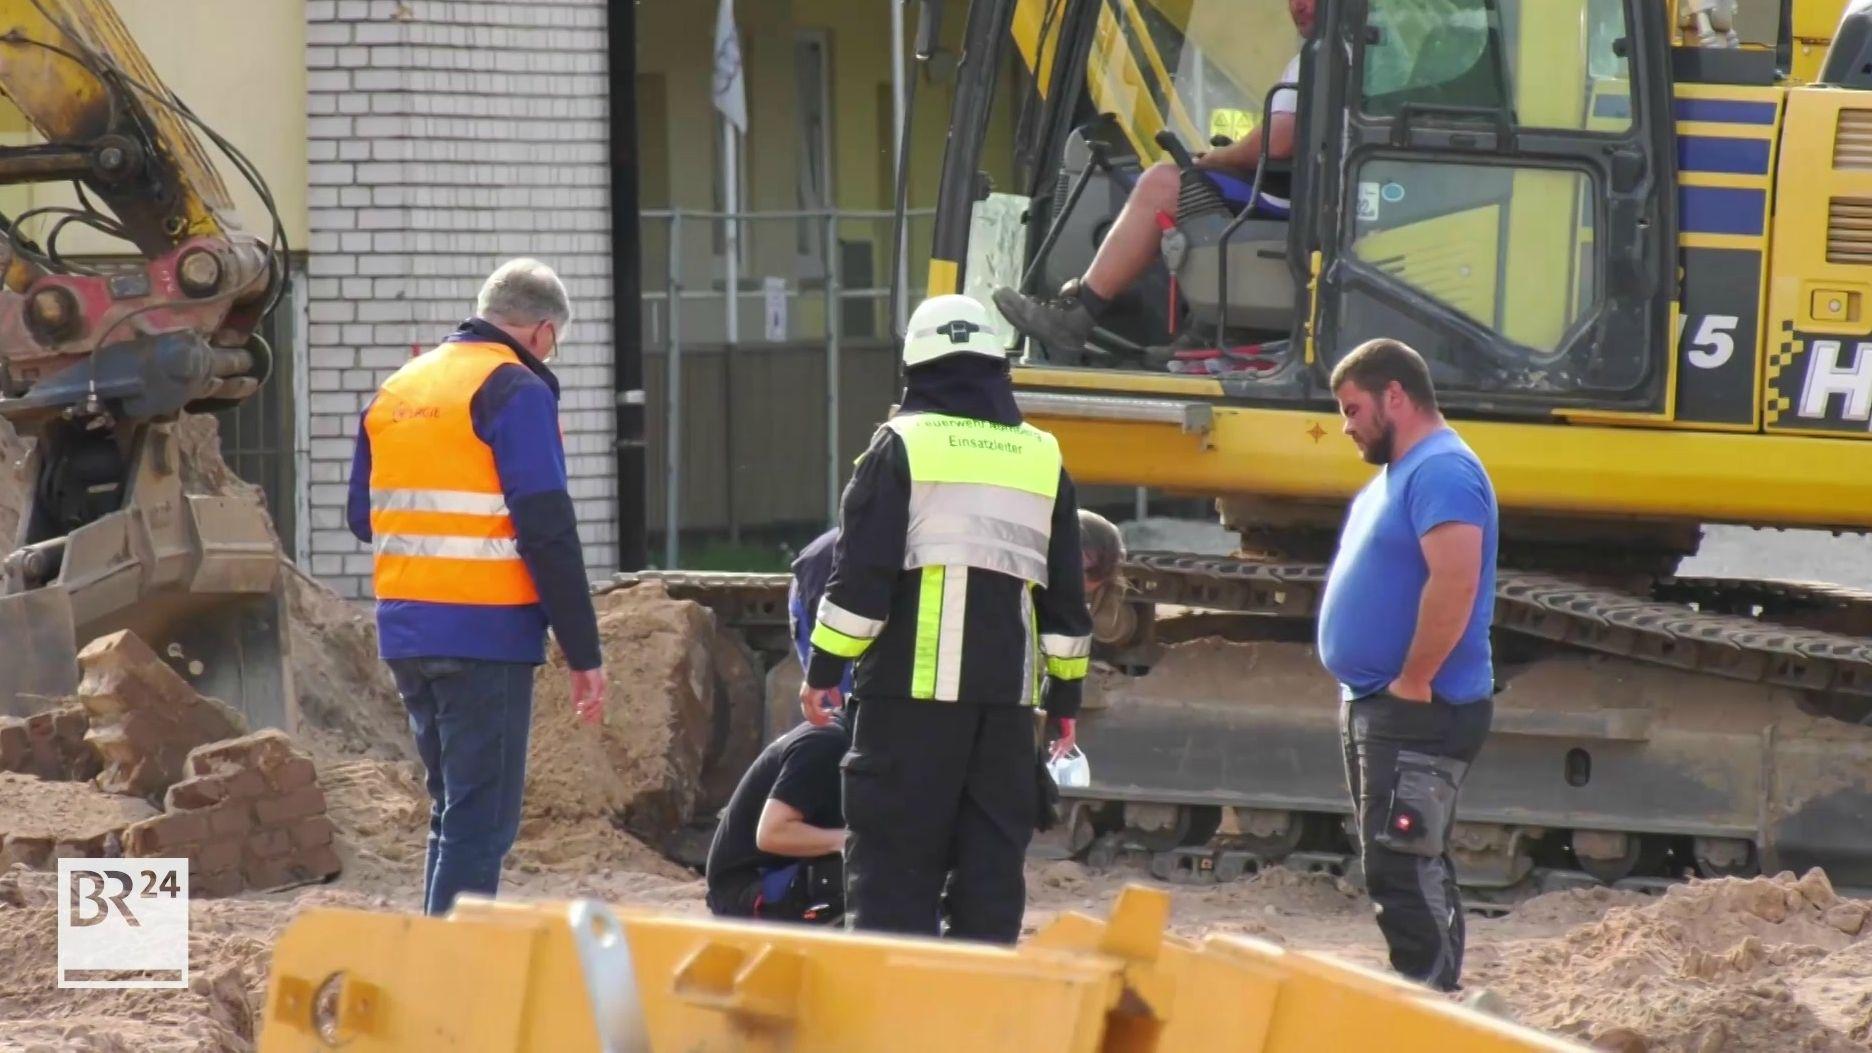 Fragment einer Fliegerbombe in Nürnberg entdeckt